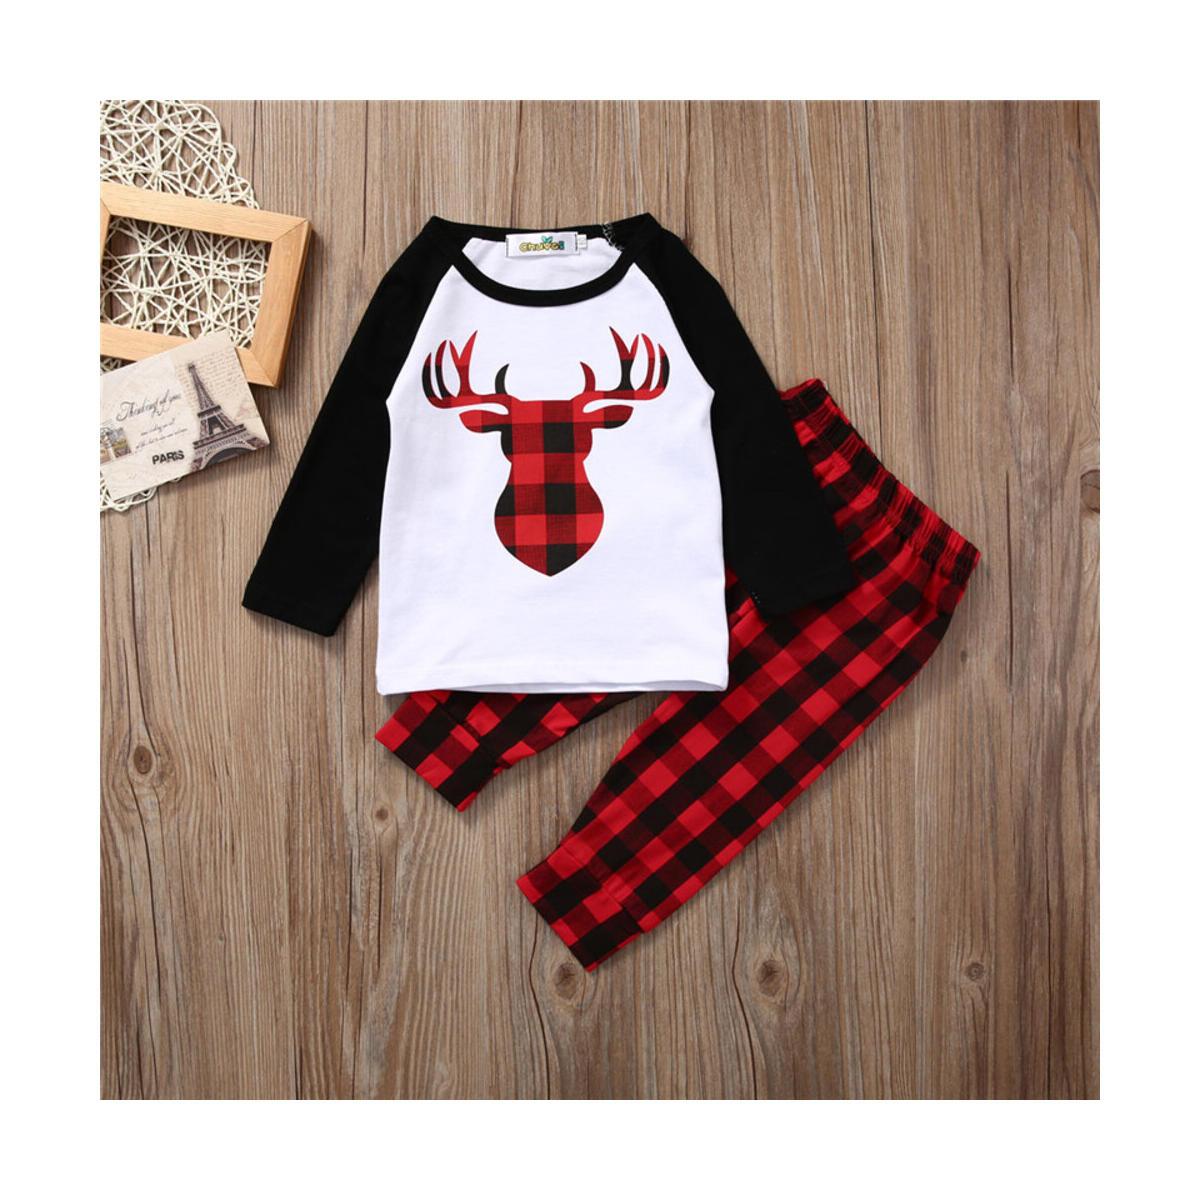 Newborn Baby Boys Girls Deer Plaid T-Shirt Top Plaid Cotton Pants Outfit